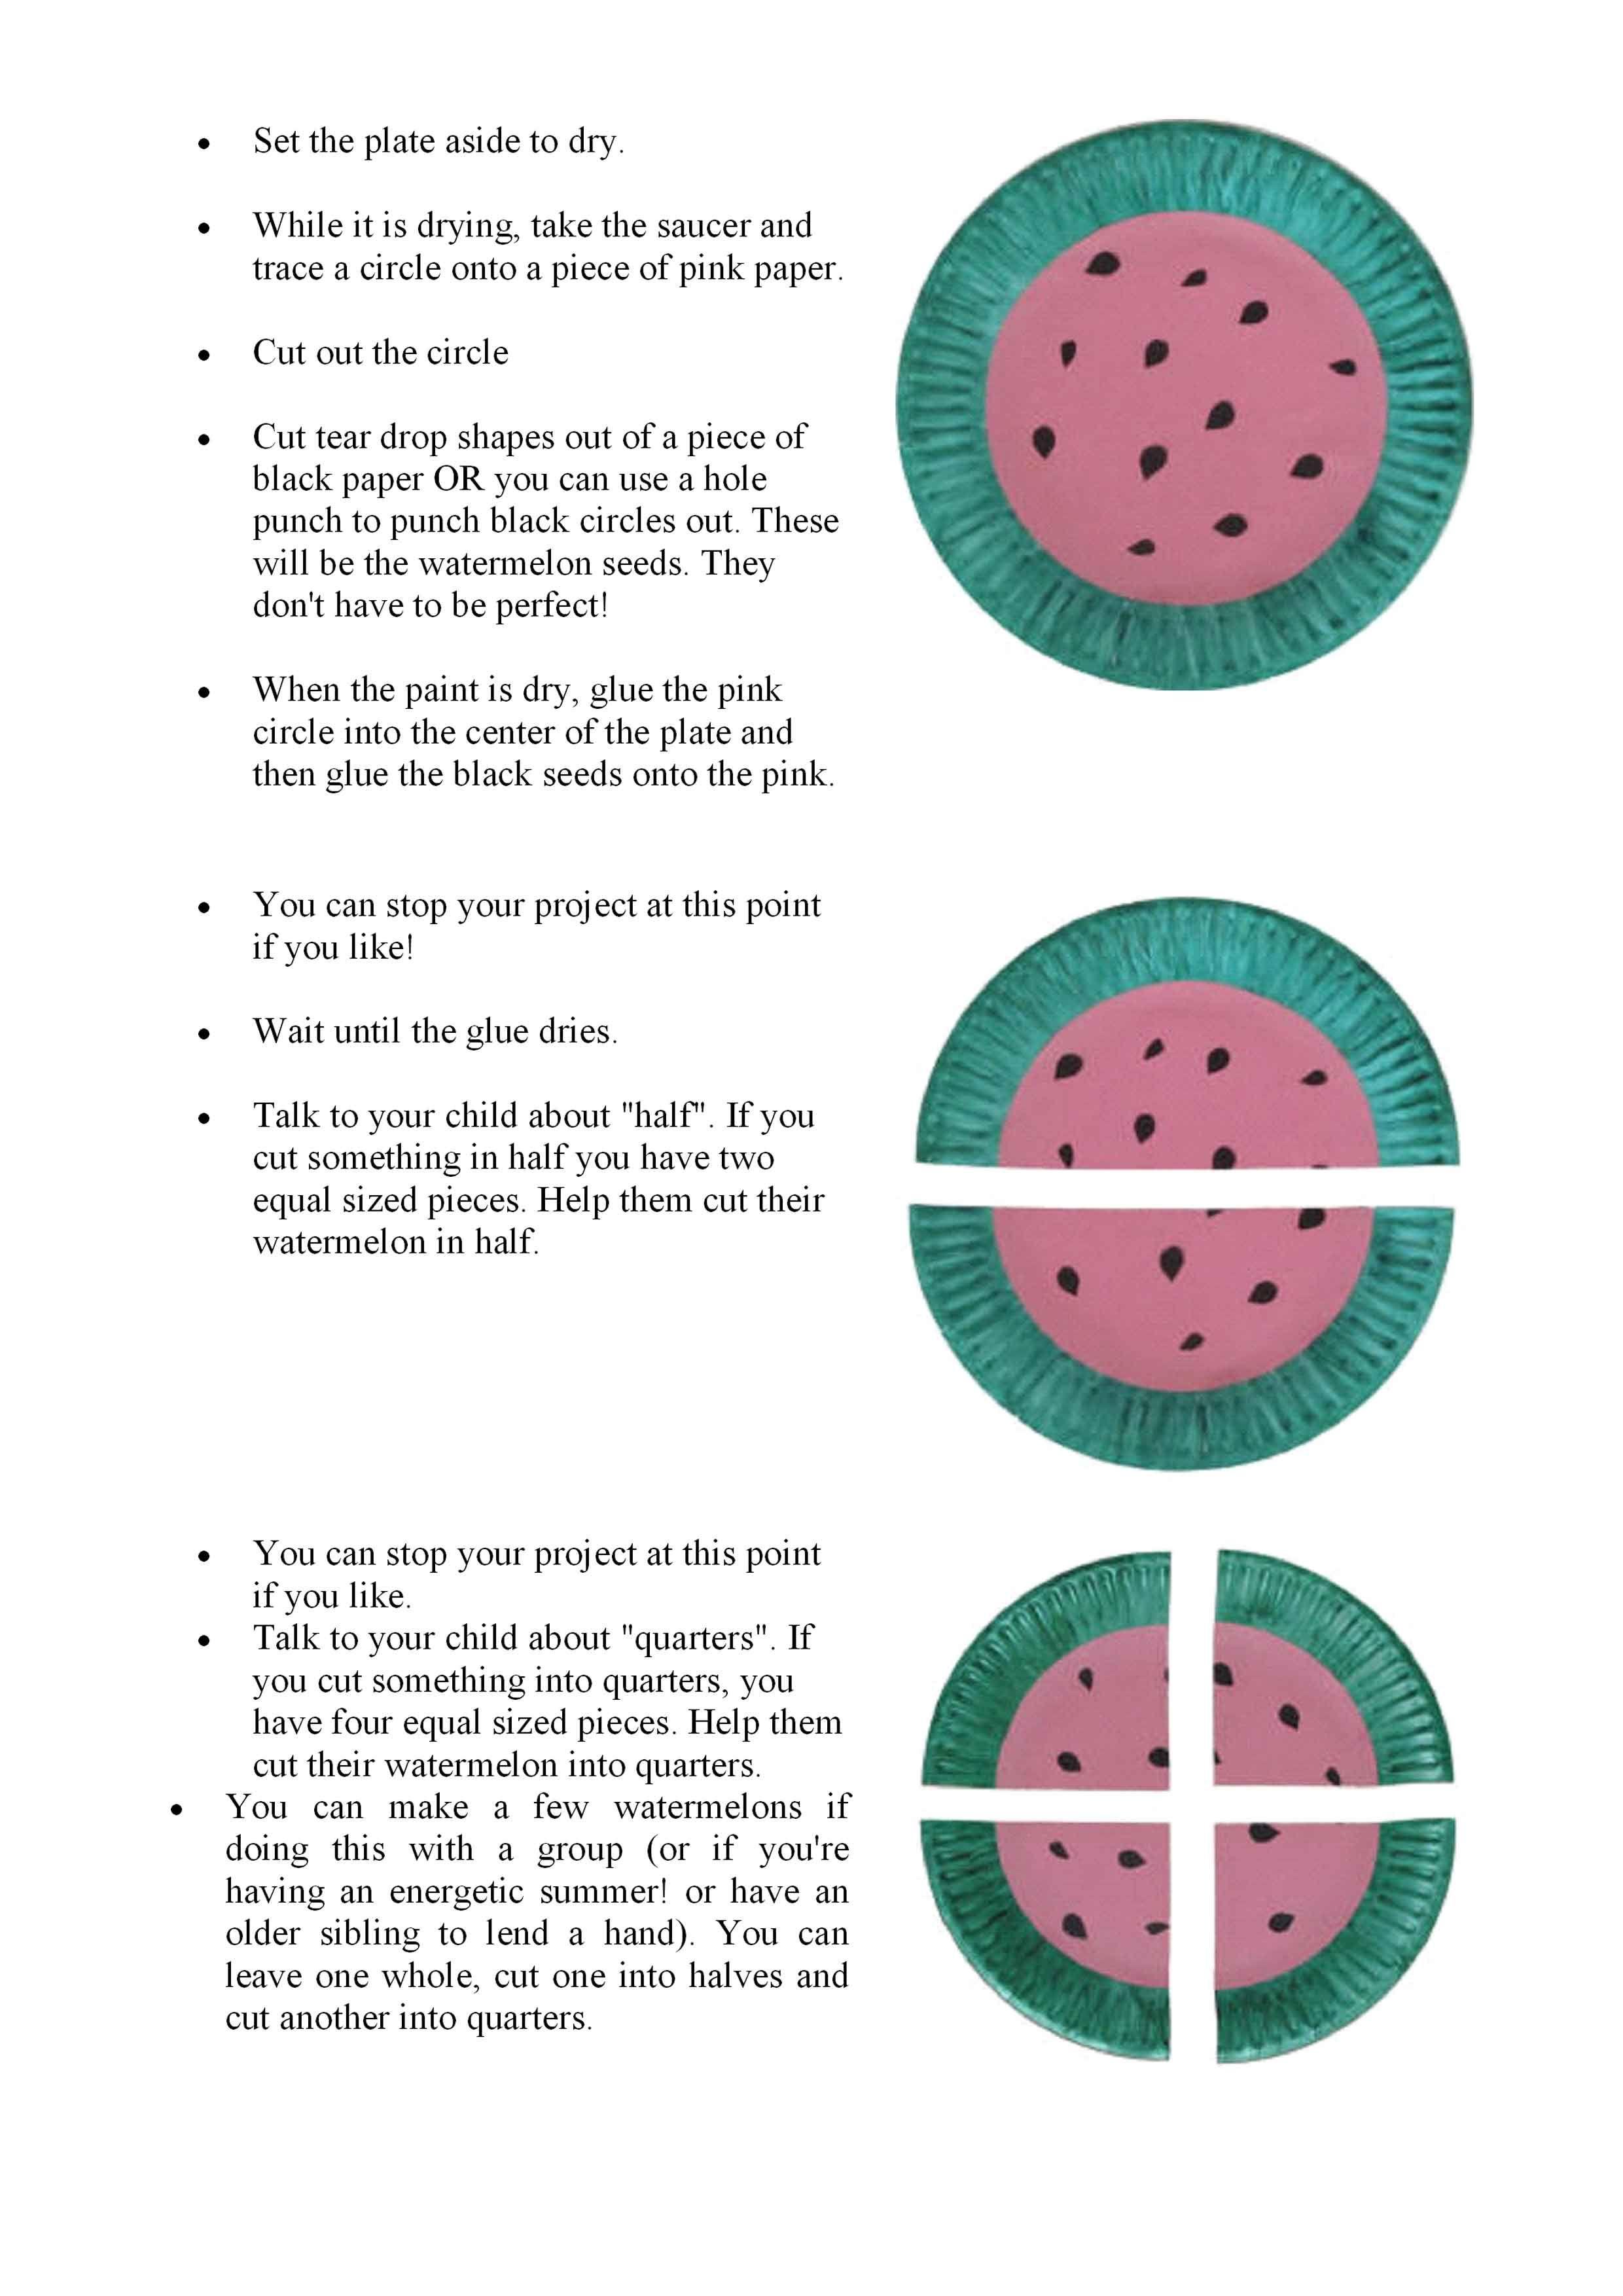 Watermelon Activity Megan Madison Coincidence That We Are Teaching Quarter Circle And Half Circle Watermelon Activities Fun Fractions Kindergarten Activities [ 3508 x 2480 Pixel ]